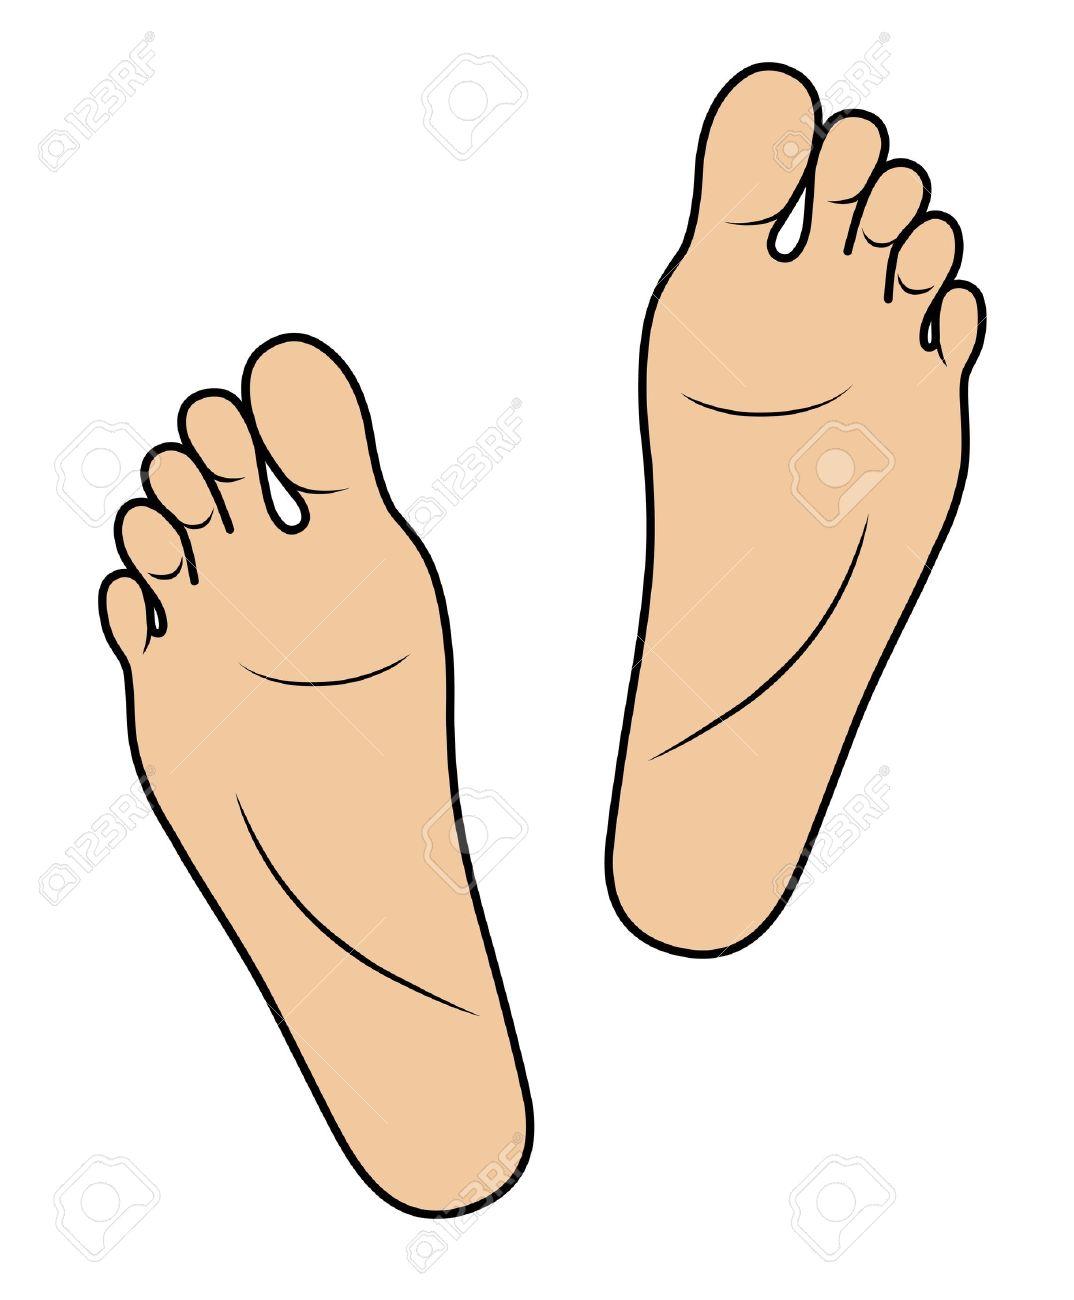 foot clipart-foot clipart-1